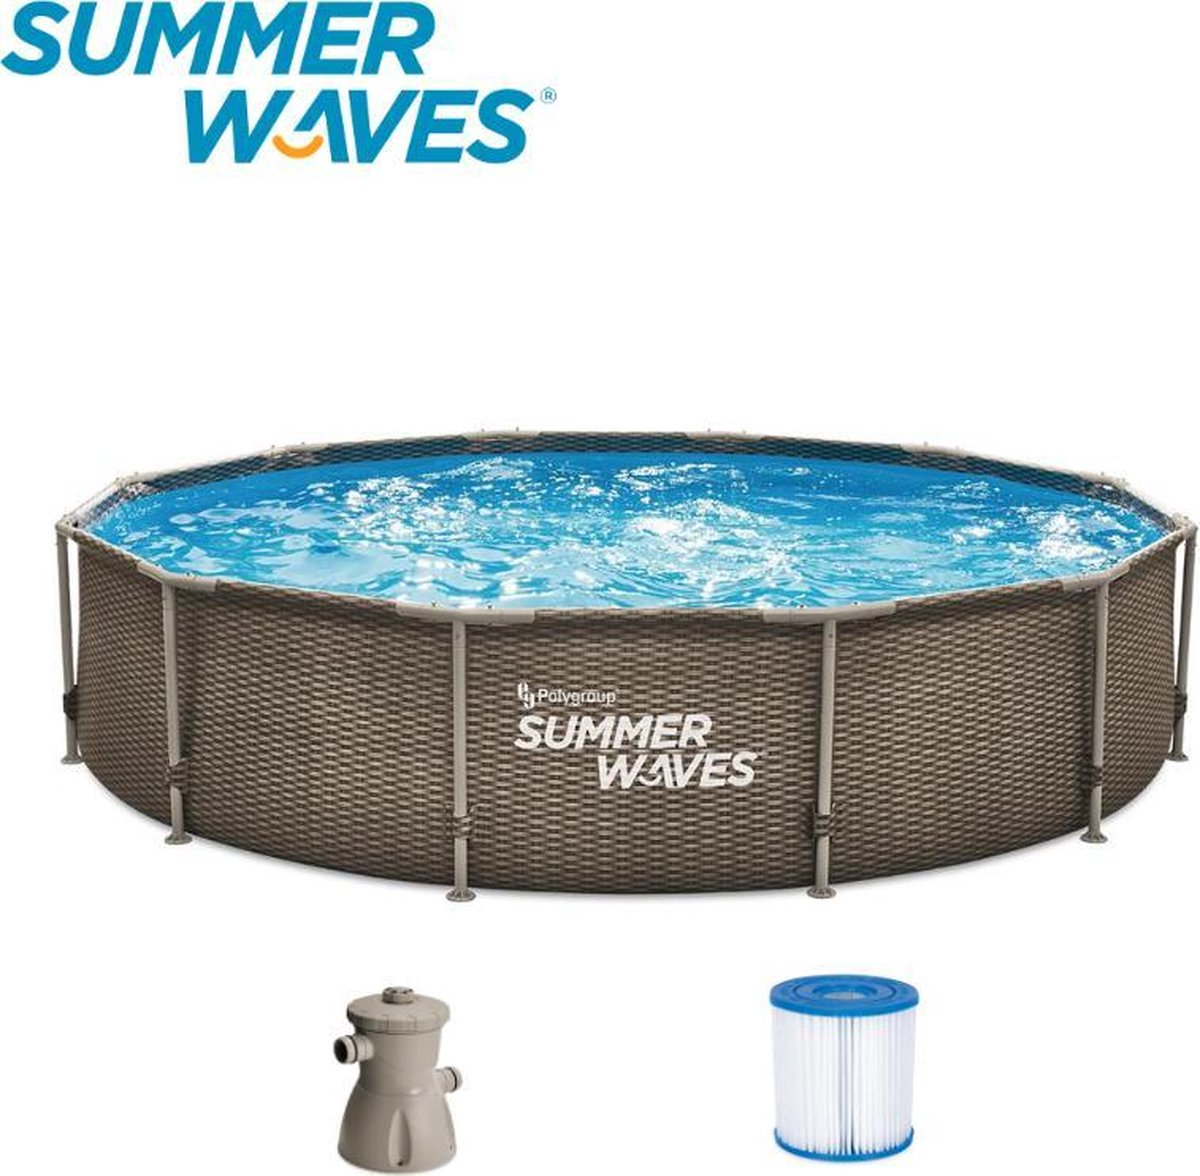 Summer Waves Frame Zwembad   Rotan l Look   Ø 305 cm x 76 xm   Inclusief Filterpomp   Bruin